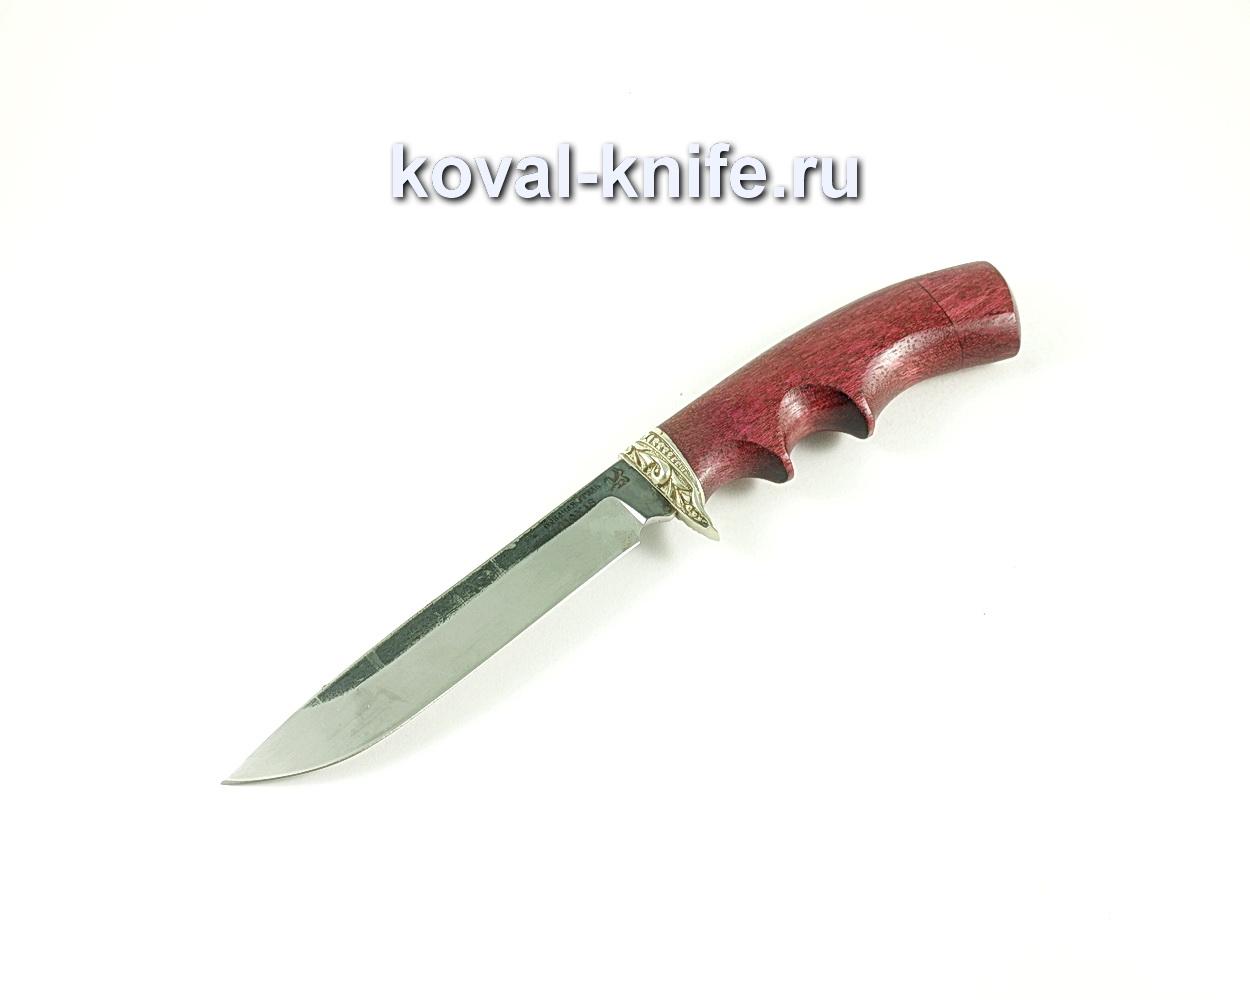 Нож Турист (сталь 110х18), рукоять амарант, литье A156